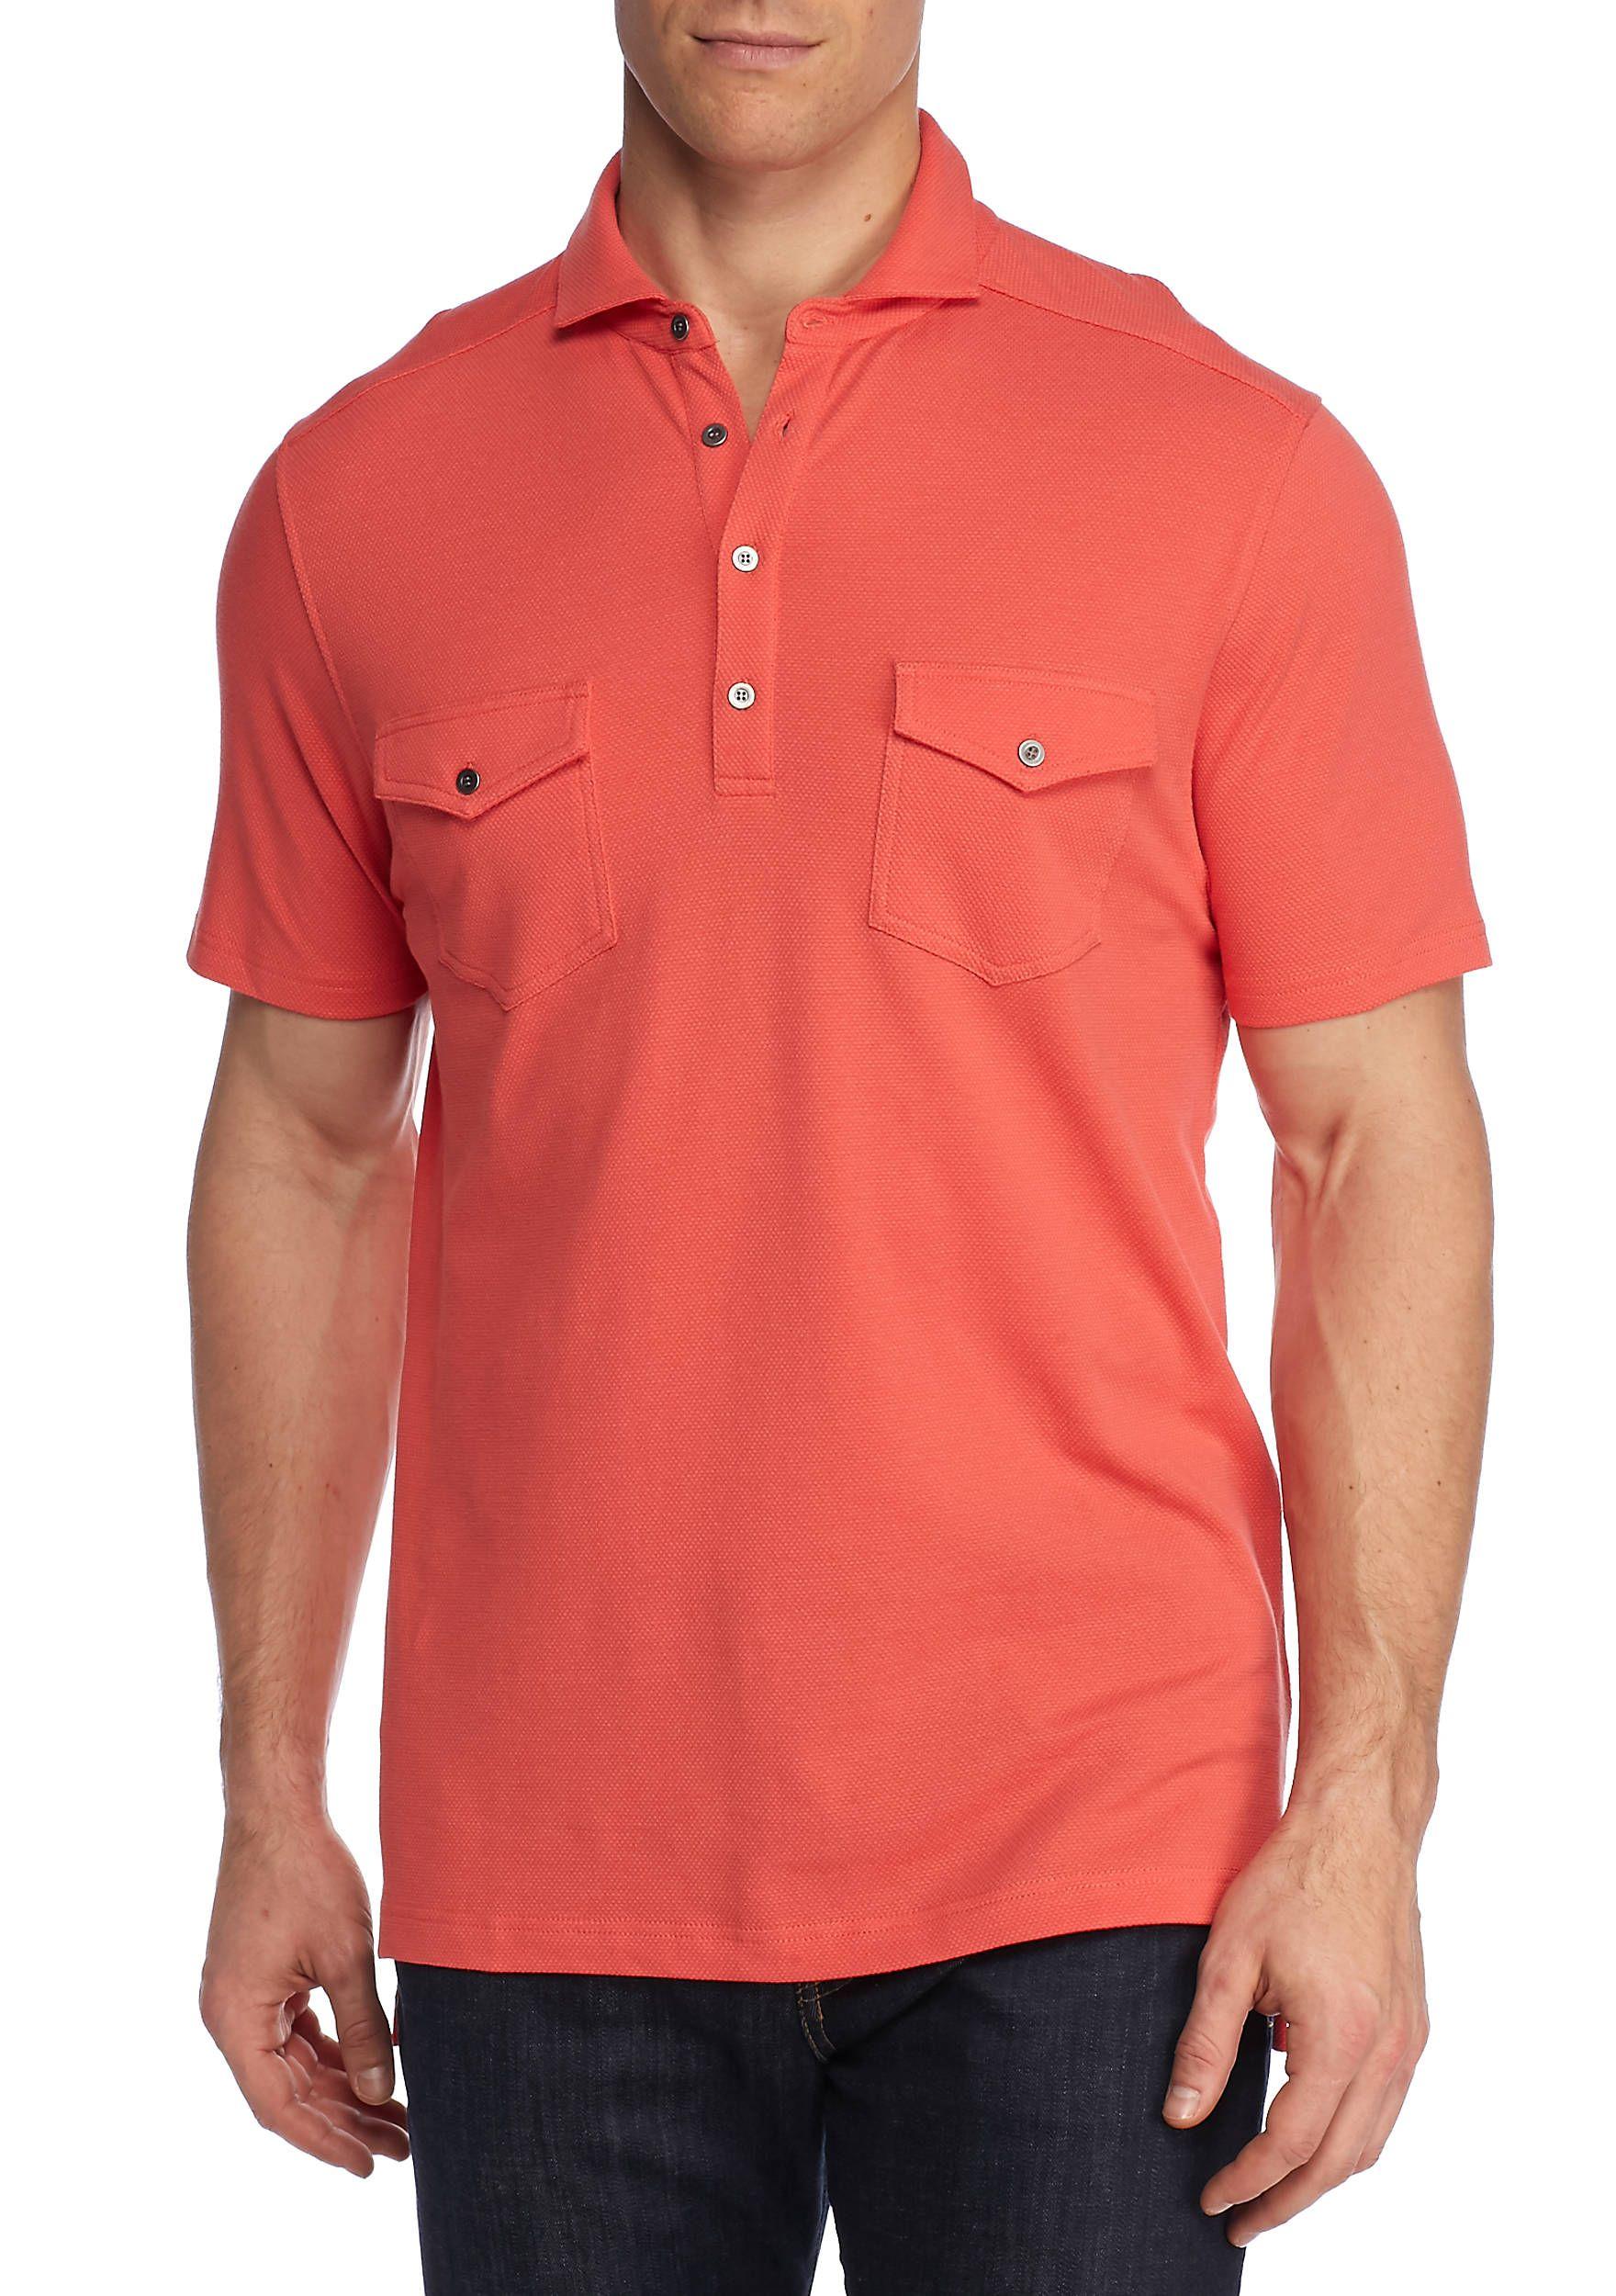 Ocean & Coast® Short Sleeve Two Pocket Polo Shirt Coral Orbit Men ...